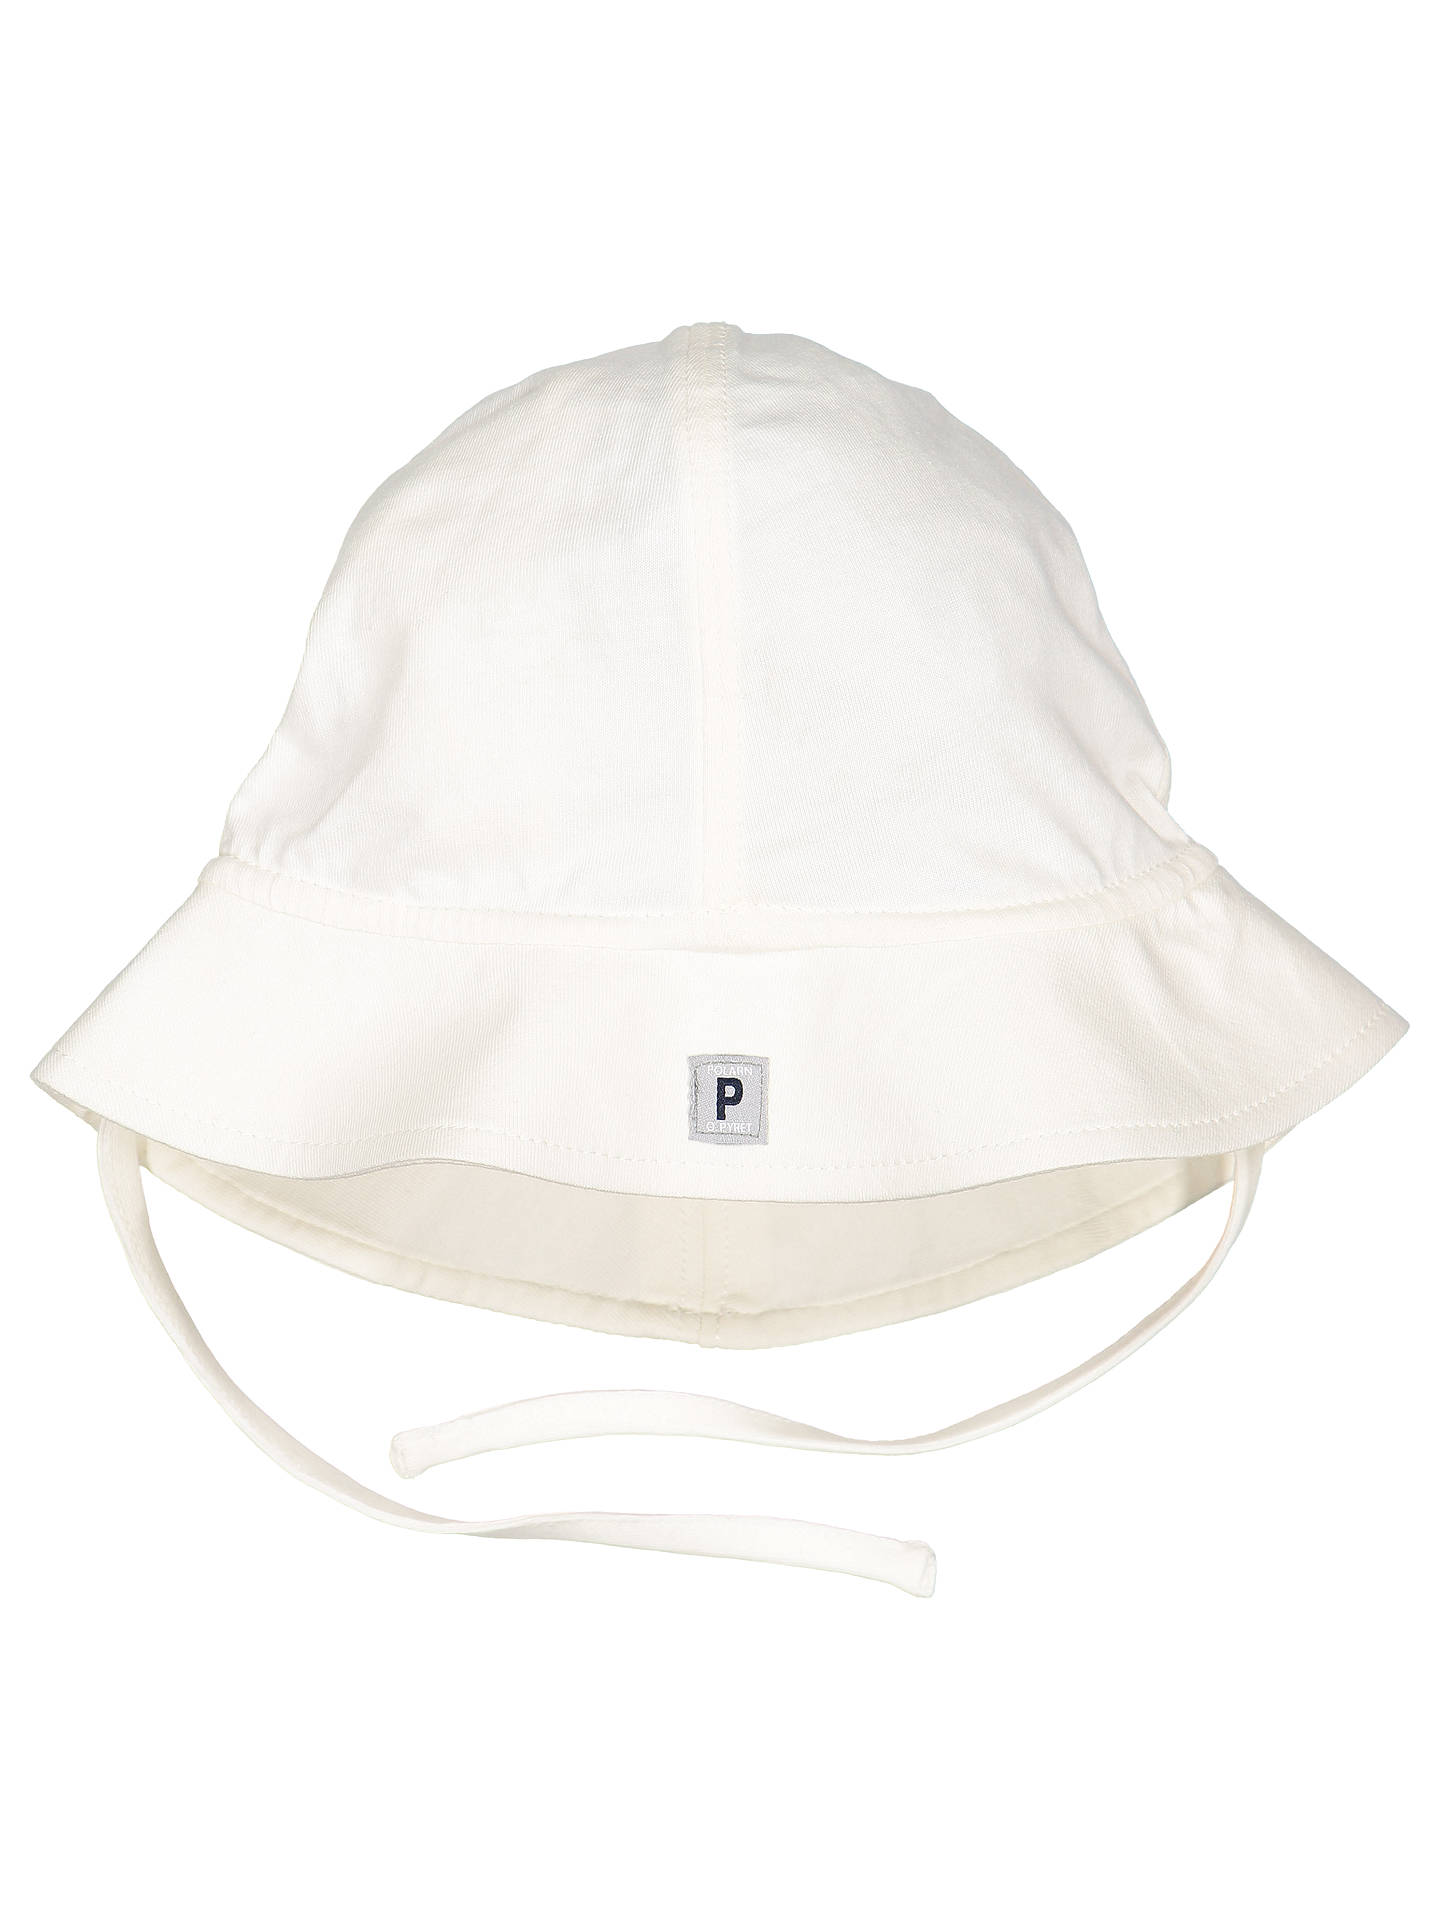 BuyPolarn O. Pyret Baby Sun Hat d47fec32b1a